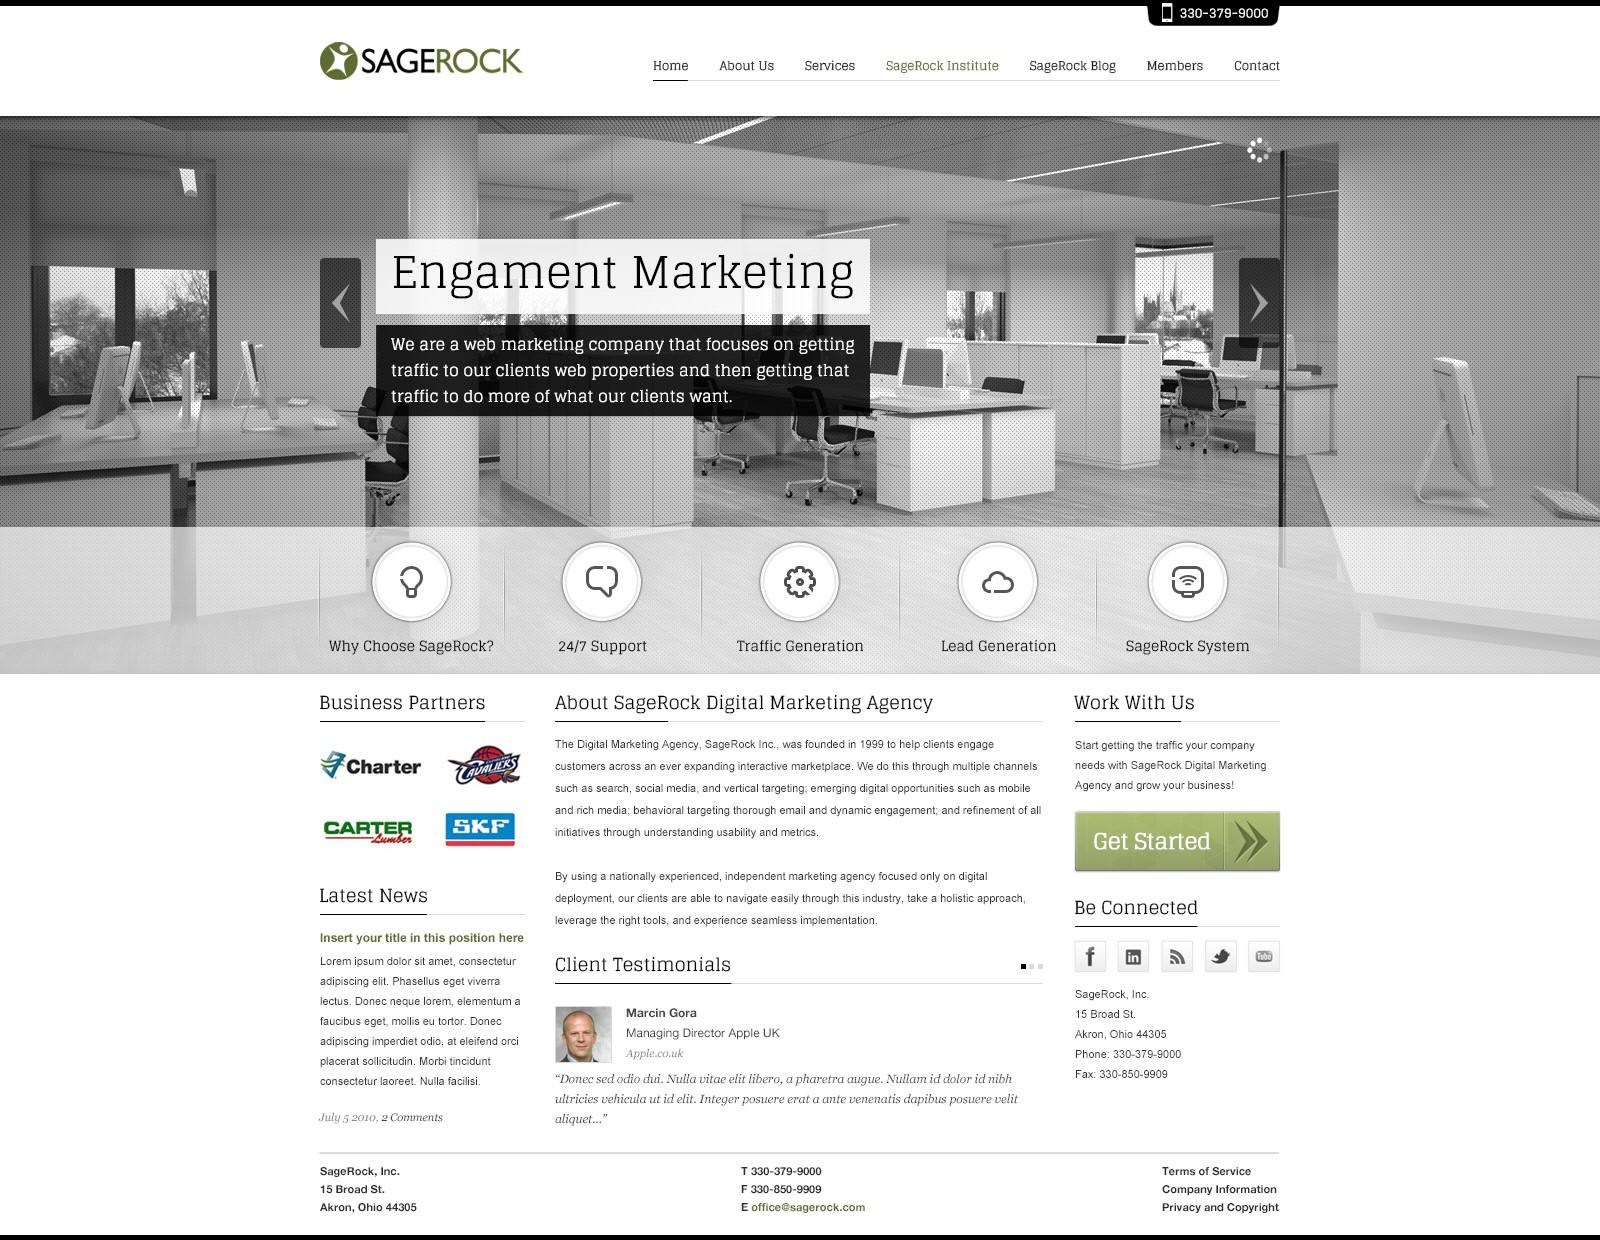 Help SageRock with a new website design